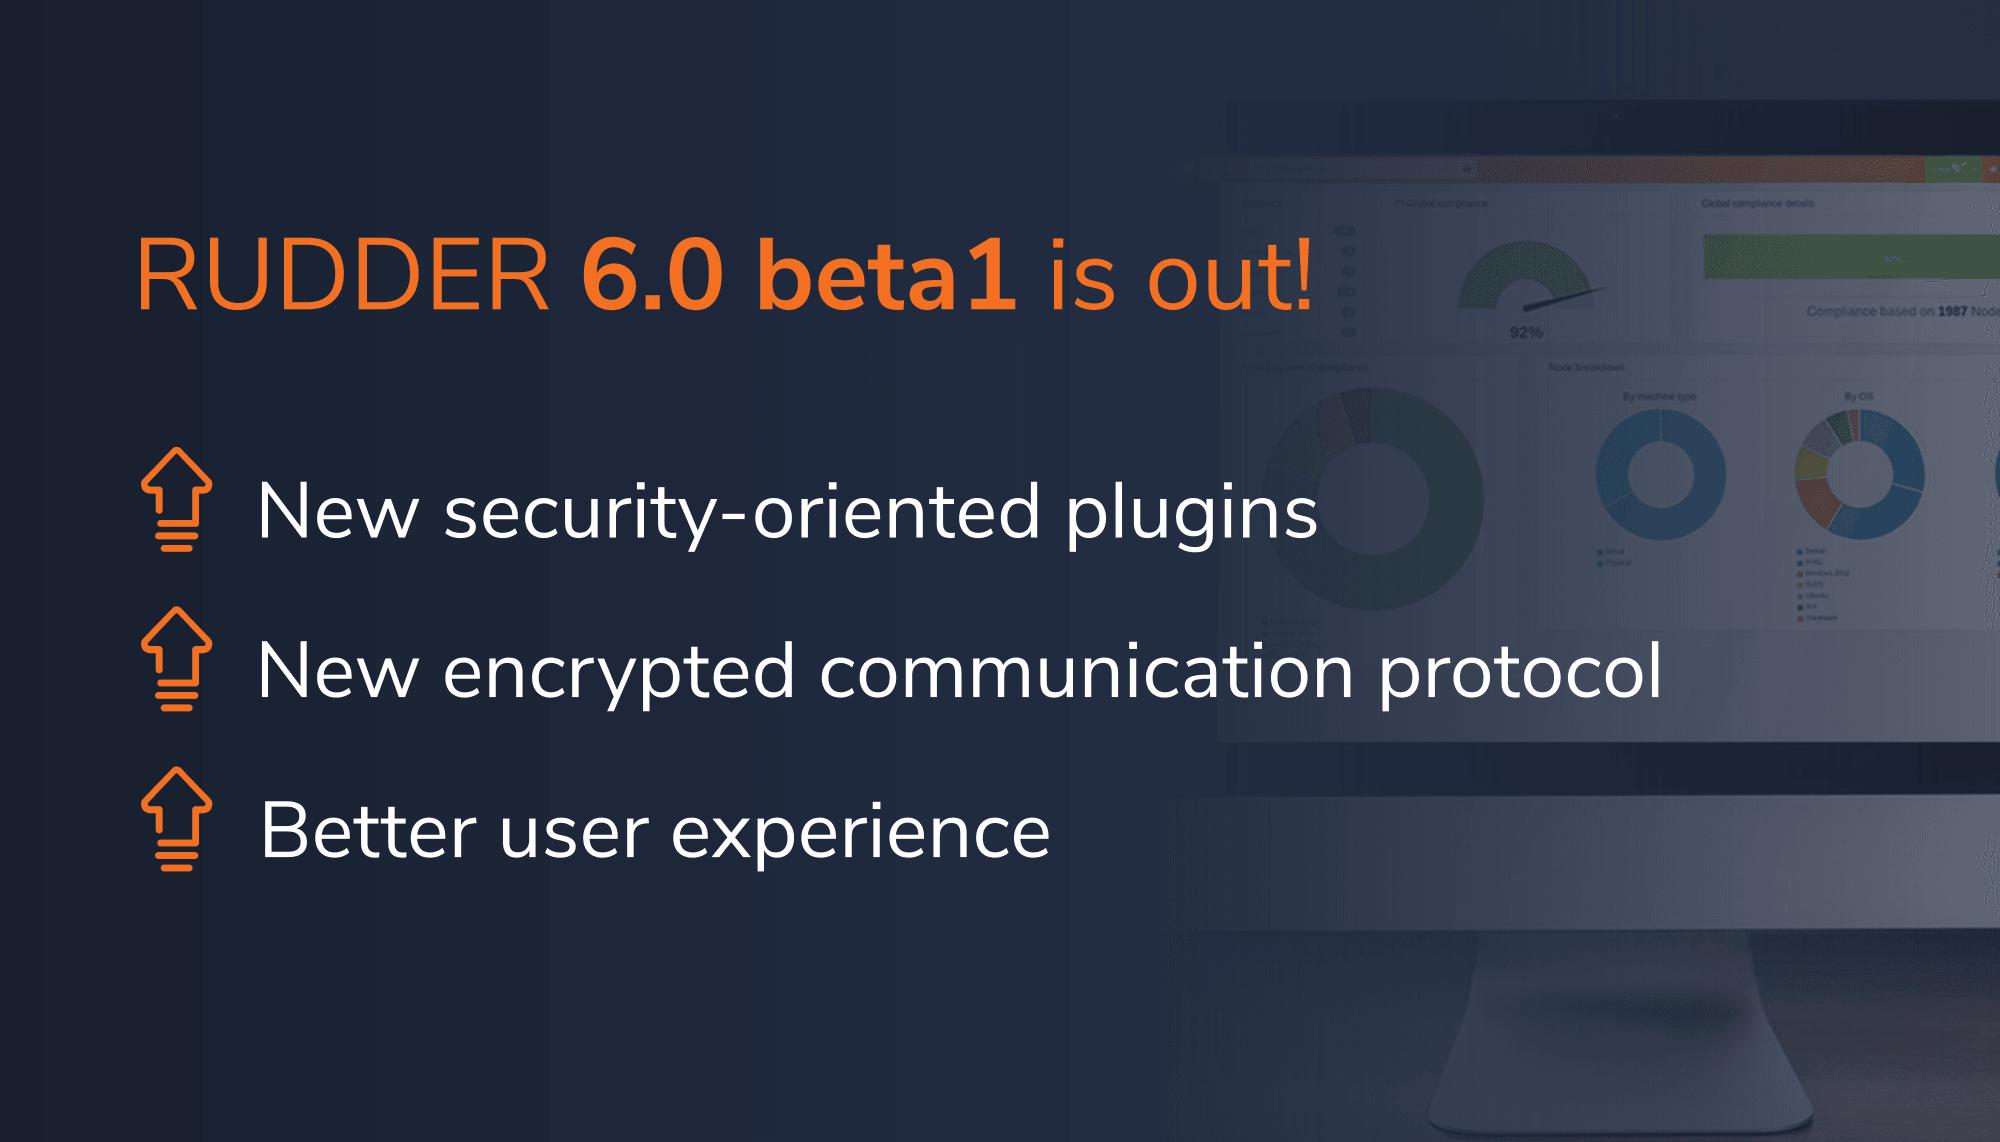 rudder-new-release-6-0-beta